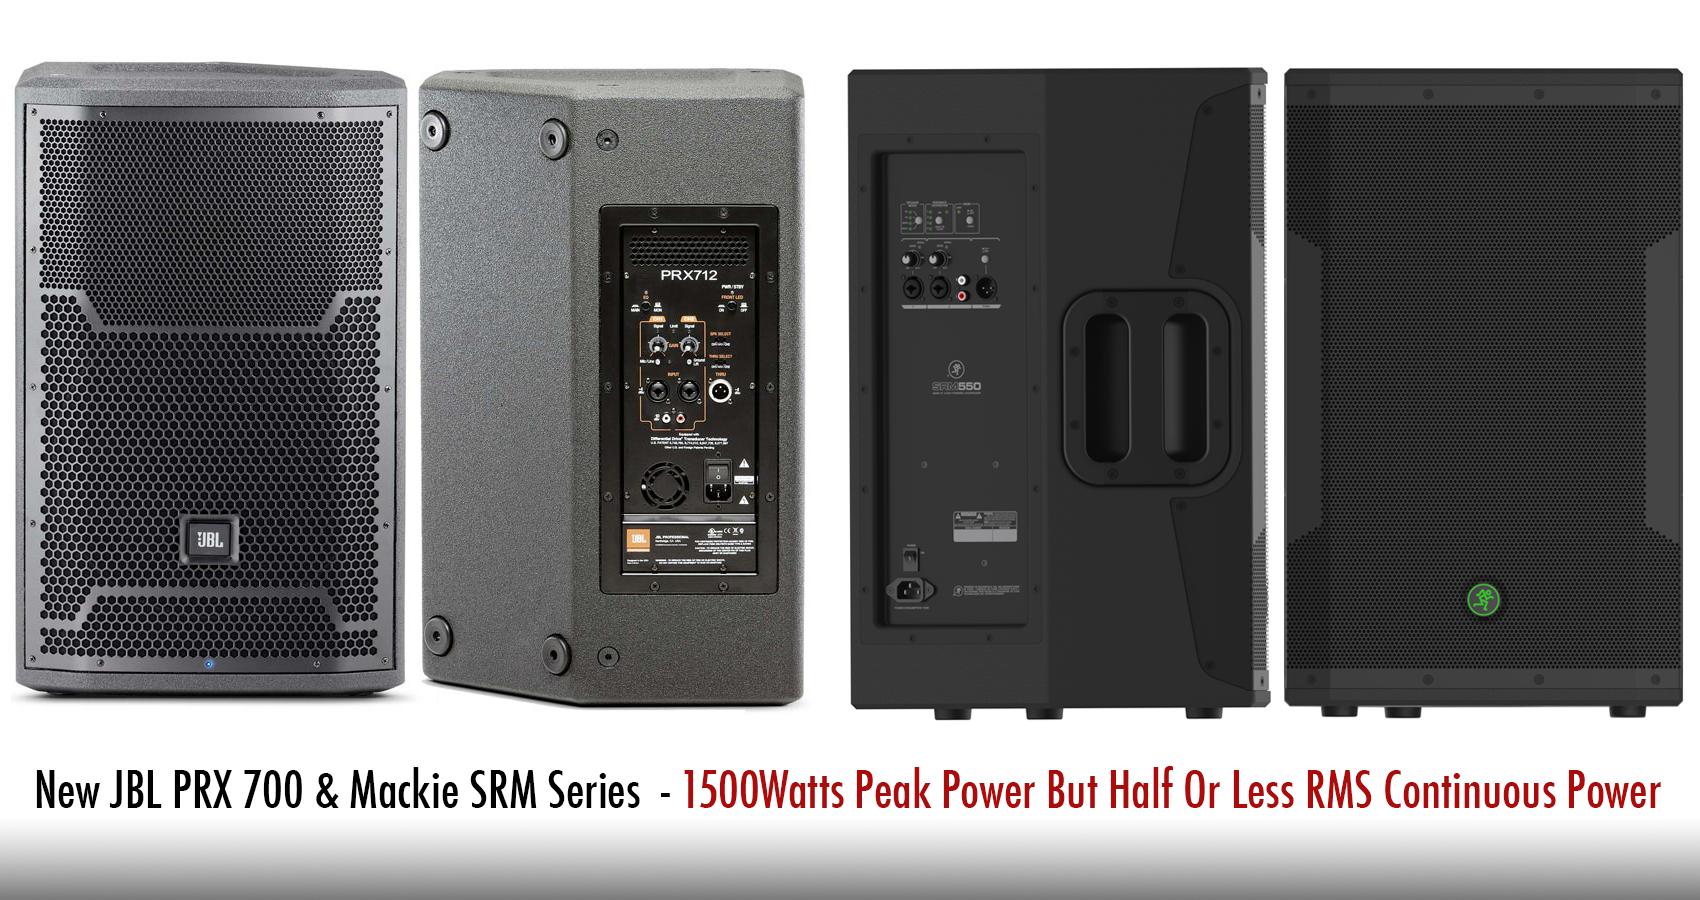 Power Ratings Of New Jbl Prx 700 Amp Mackie Srm Series